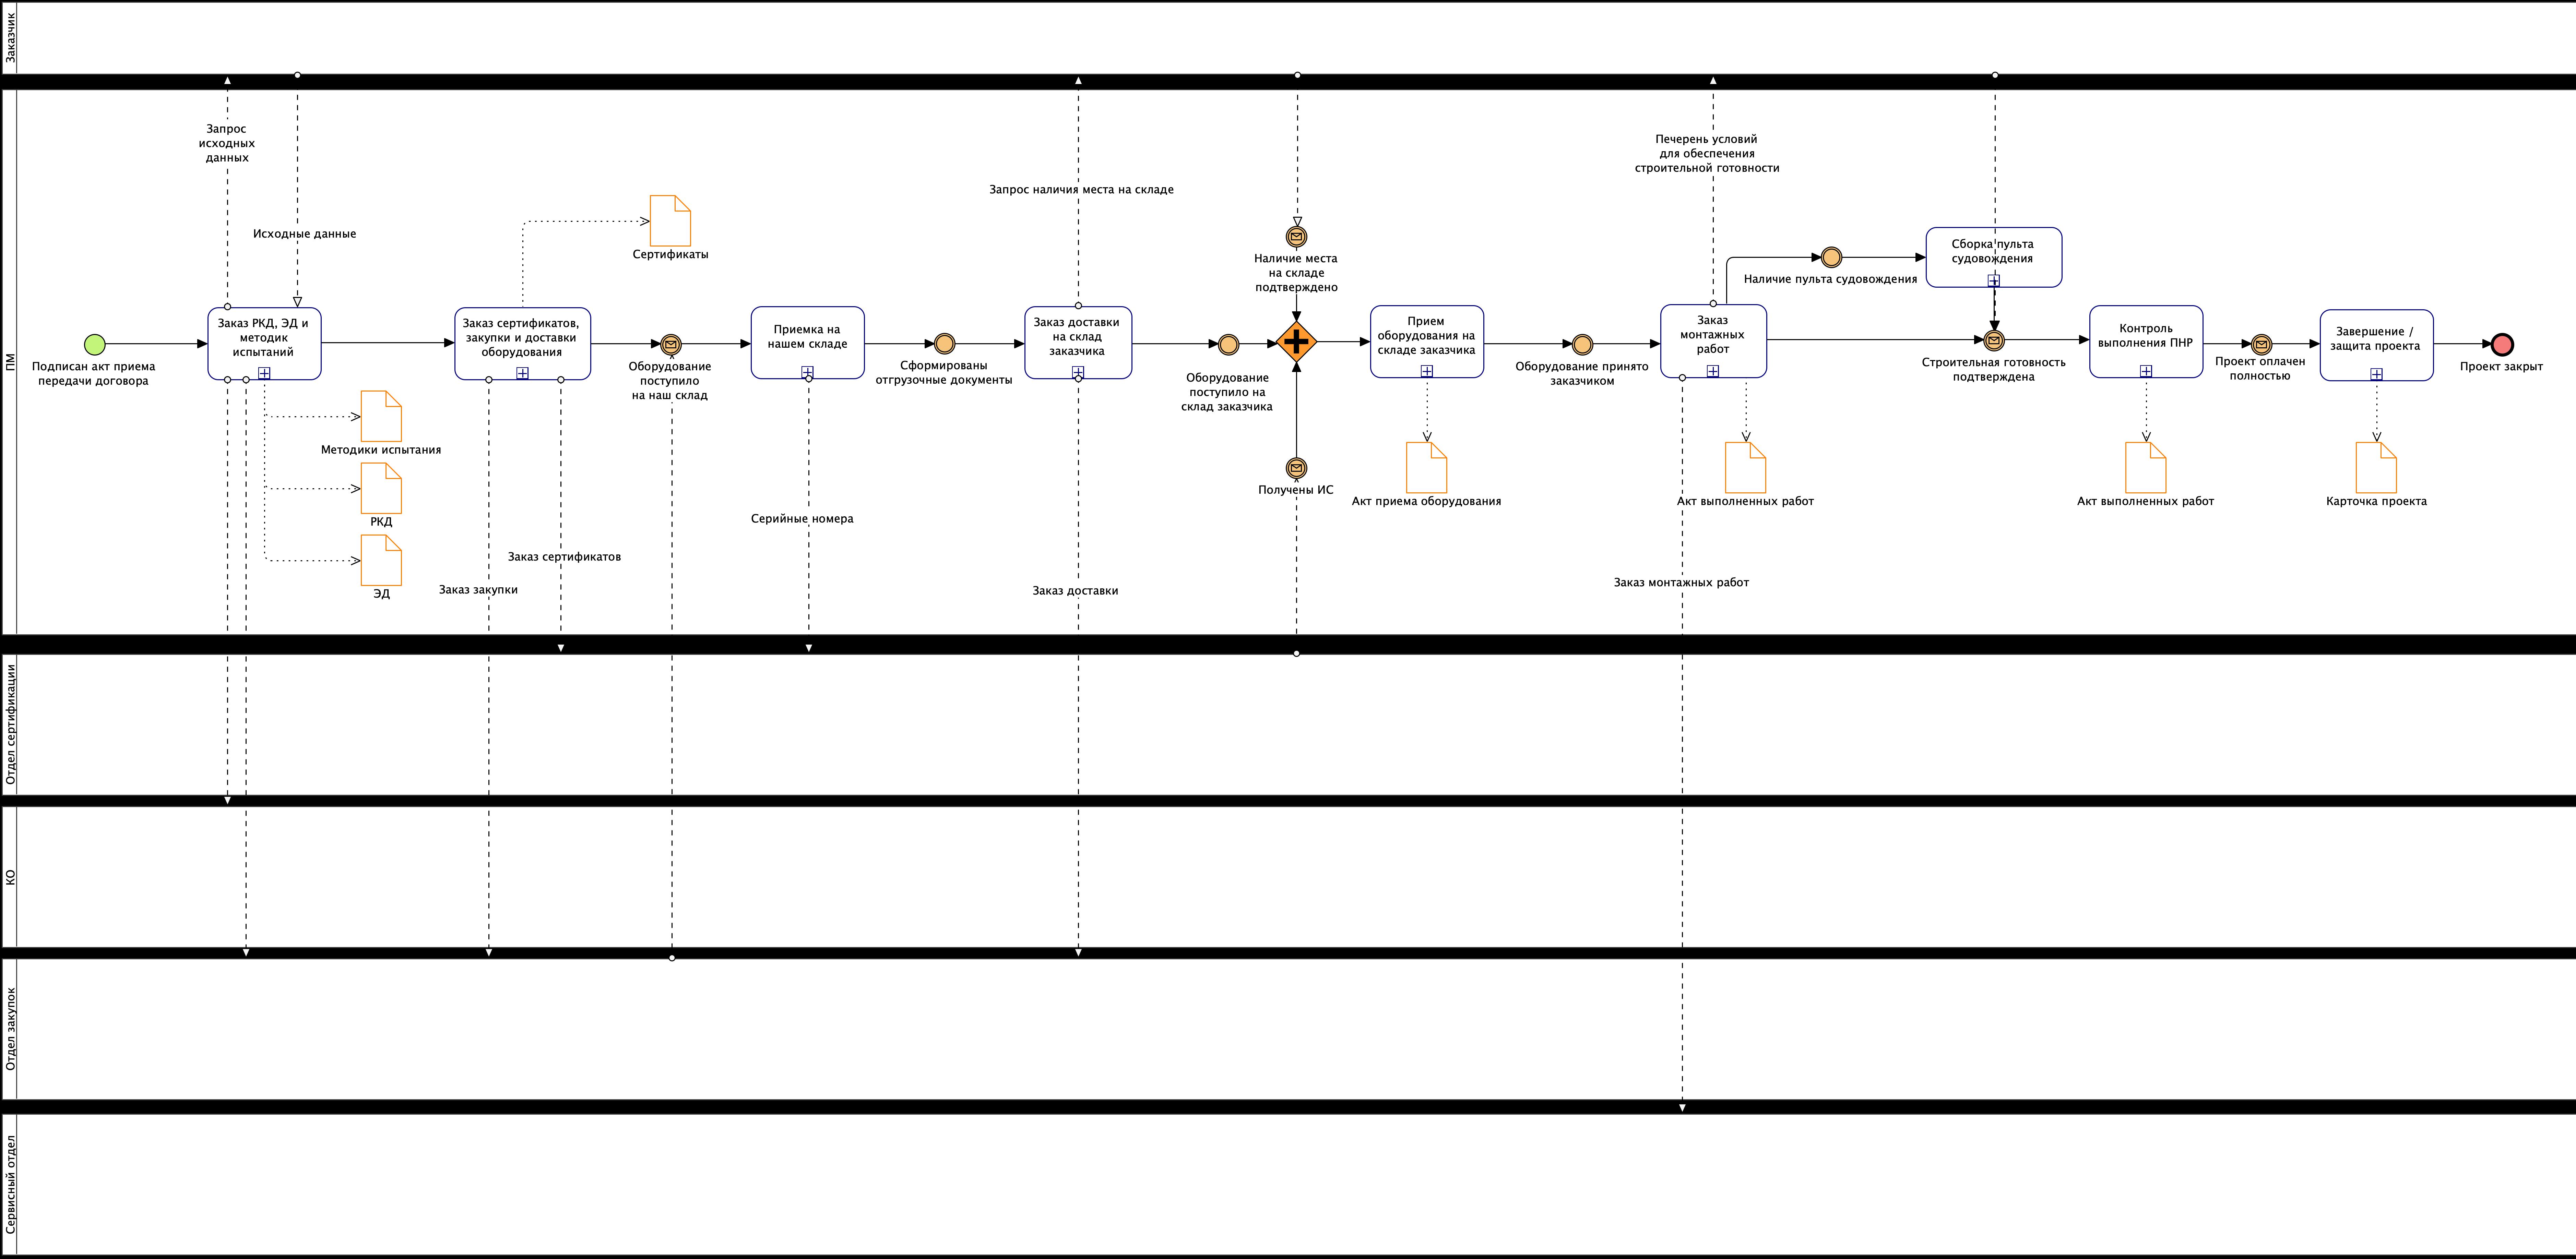 Пример регламента процесса. Управление проектами по реализации заказов клиентов